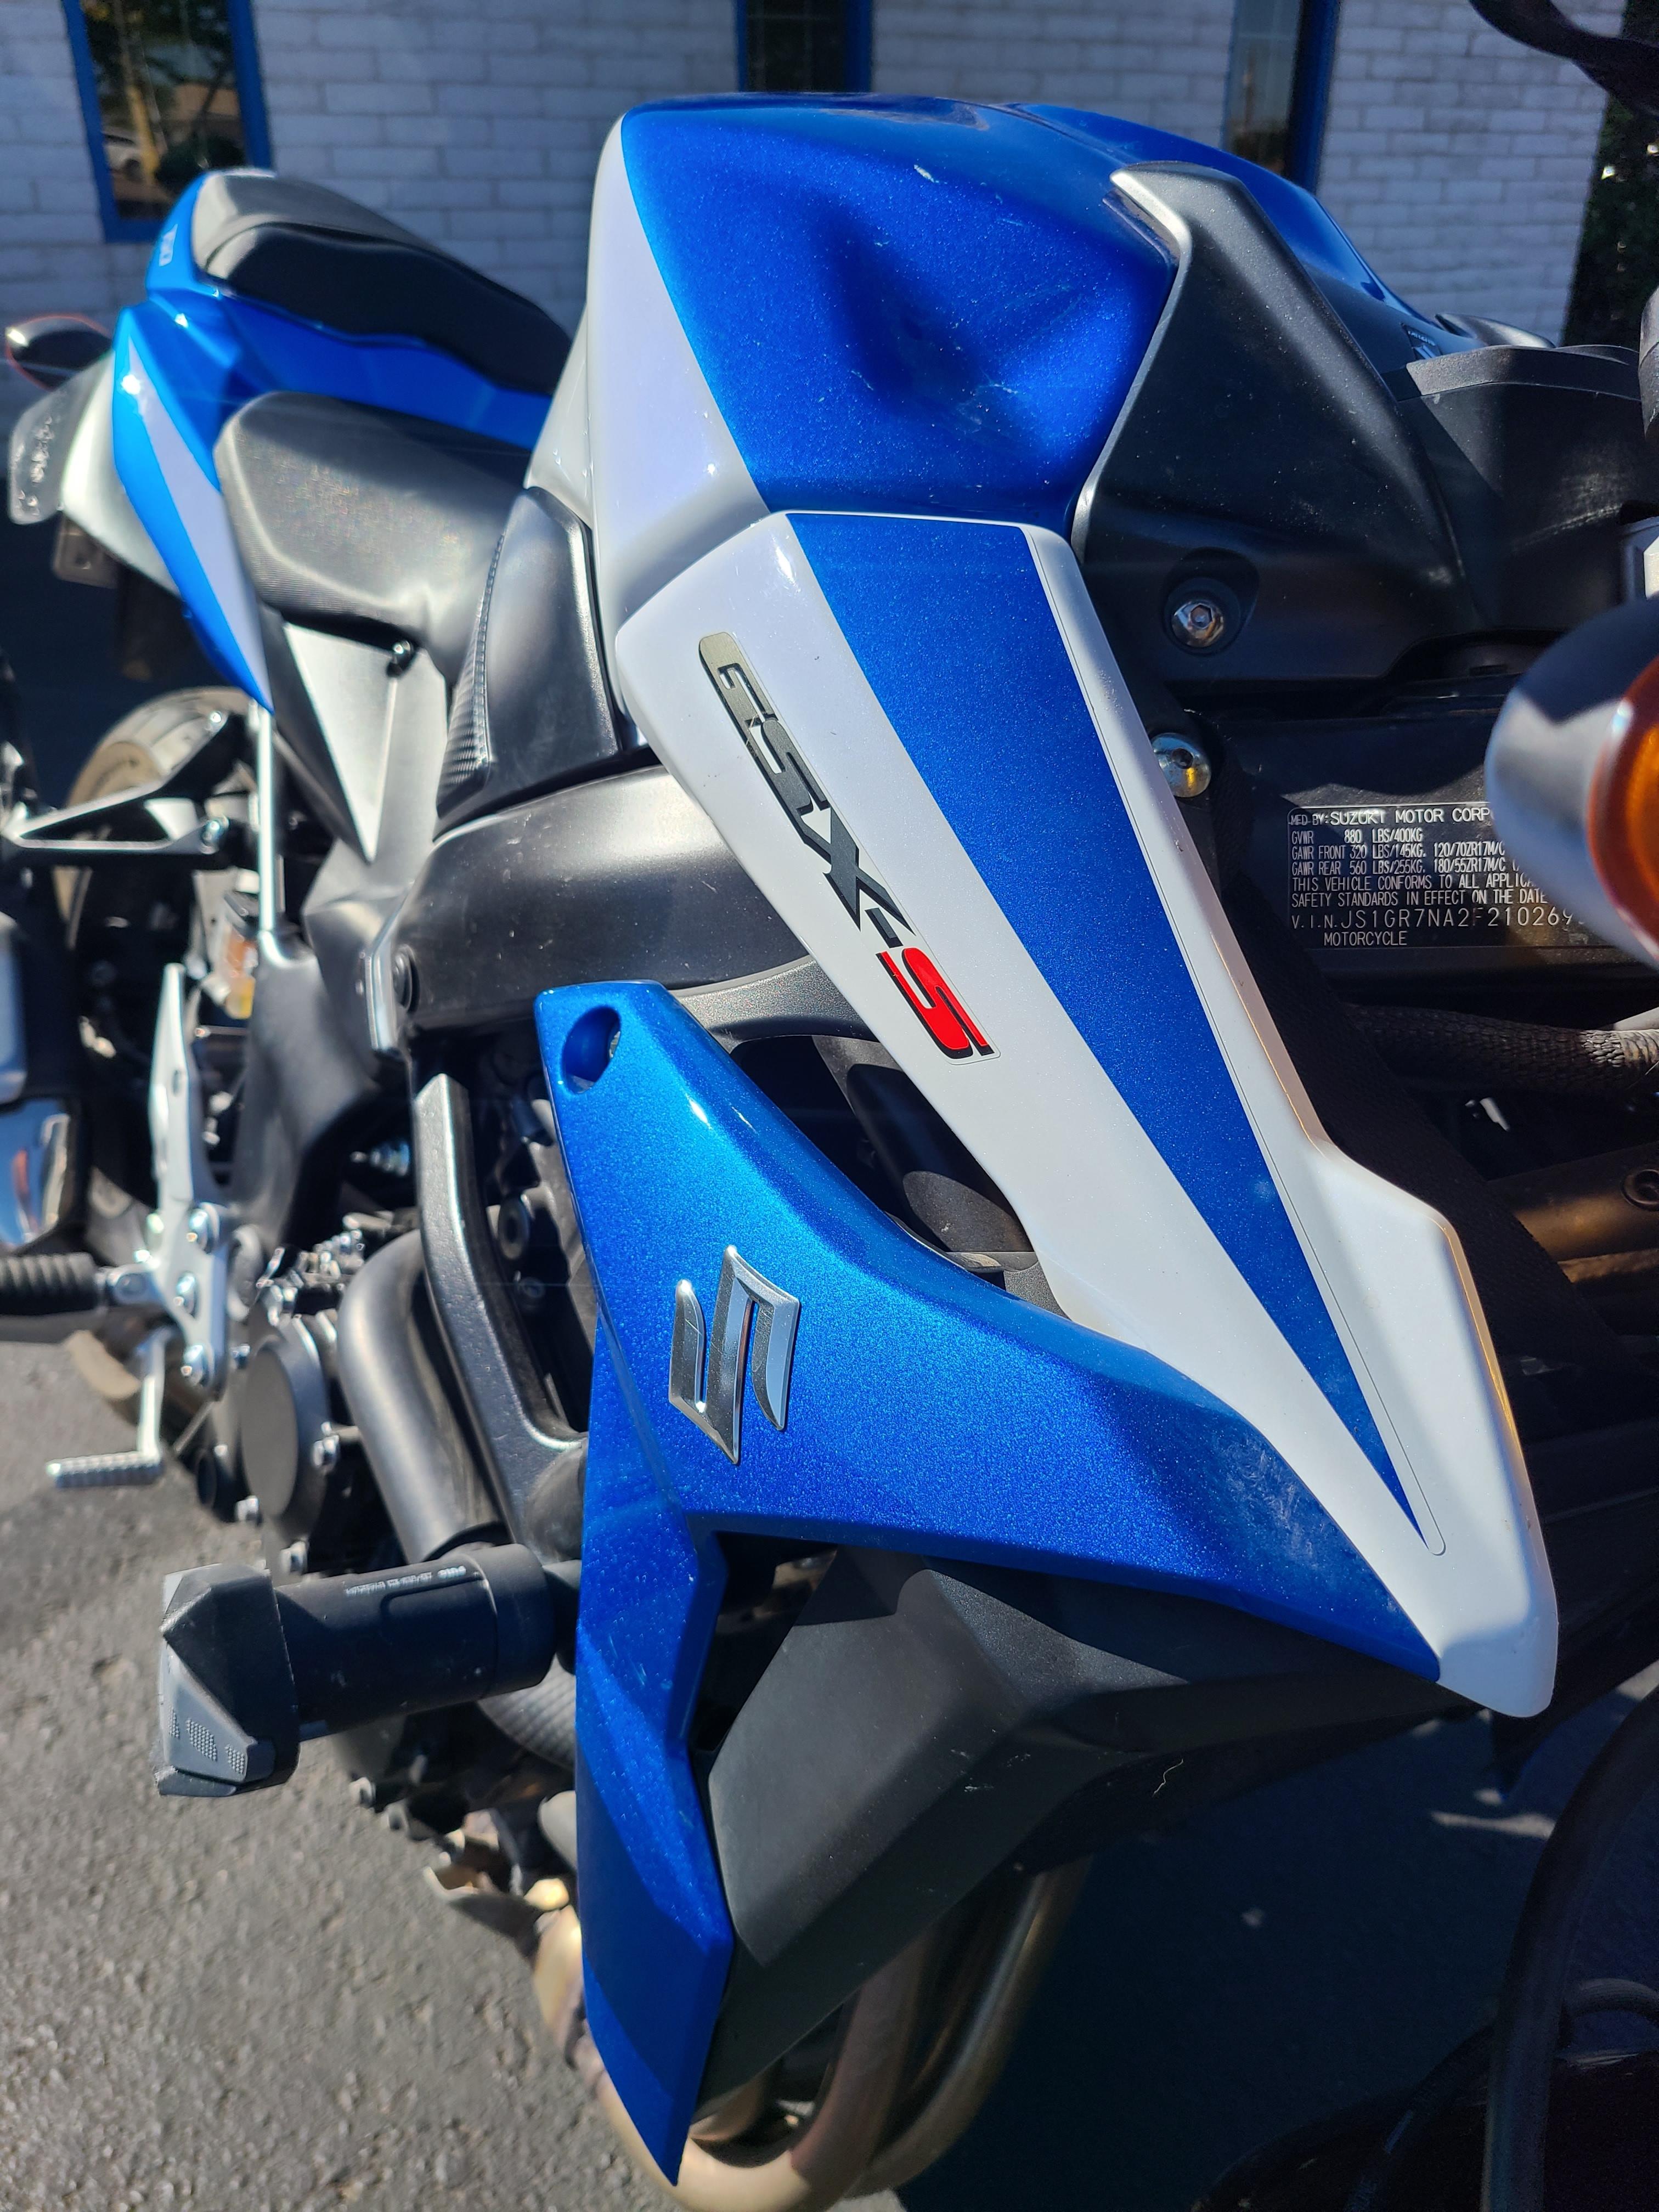 2015 Suzuki GSX-S 750 at Bobby J's Yamaha, Albuquerque, NM 87110